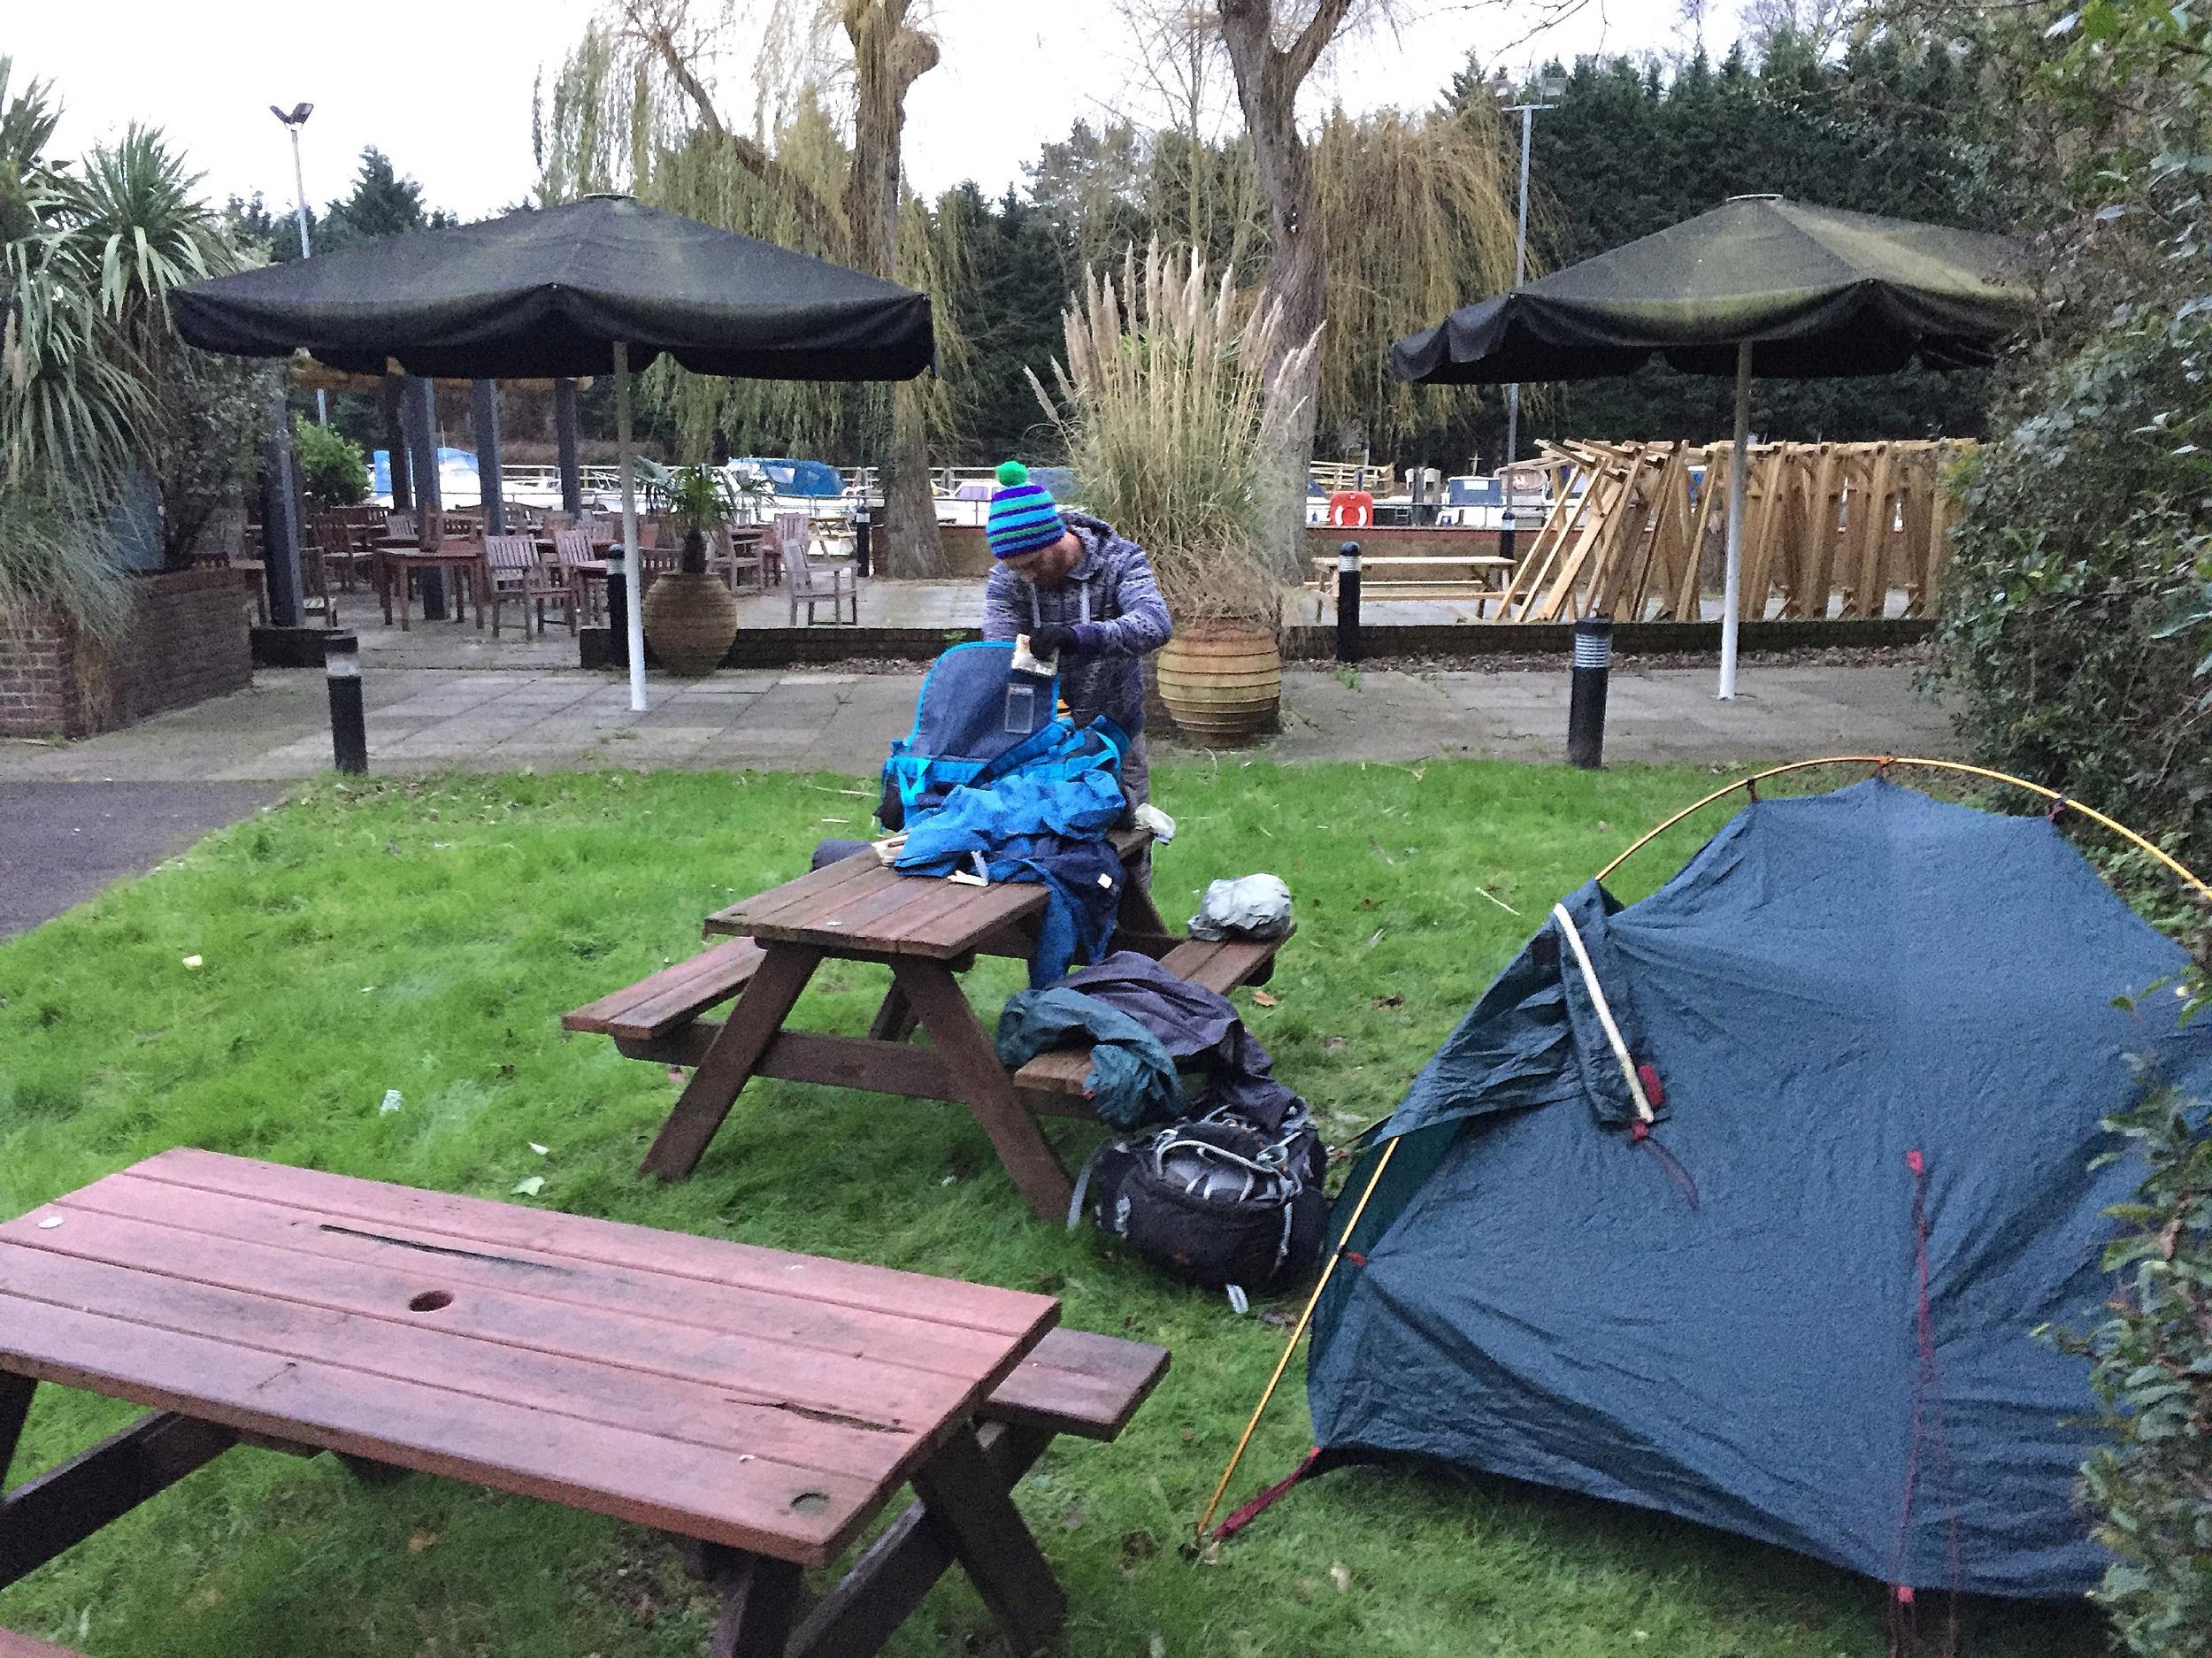 Camping in a pub beer garden